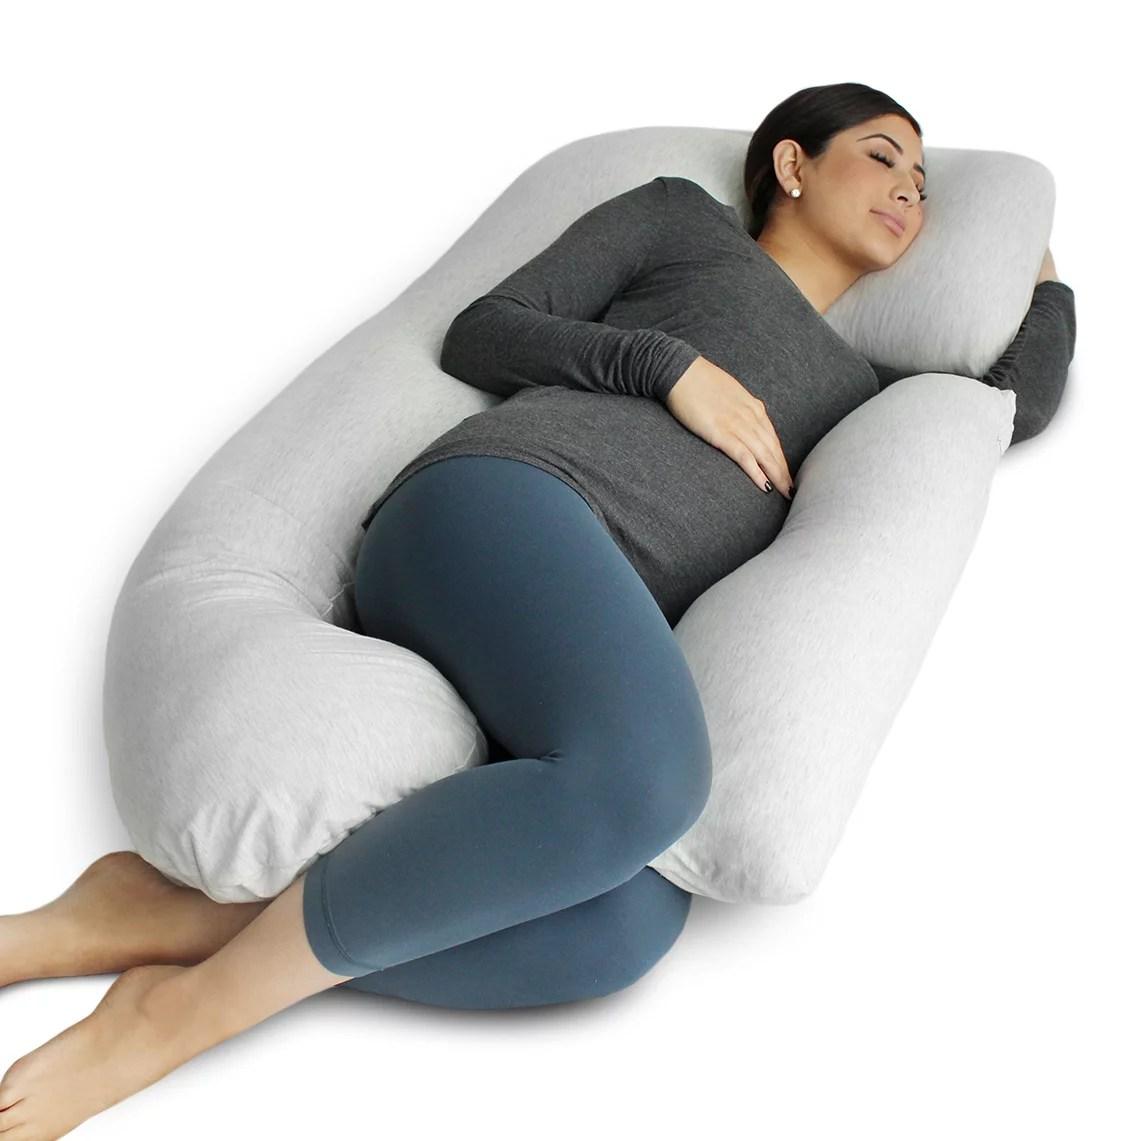 pharmedoc full body pregnancy pillow u shaped body pillow maternity pillow for pregnant women w detachable extension walmart com